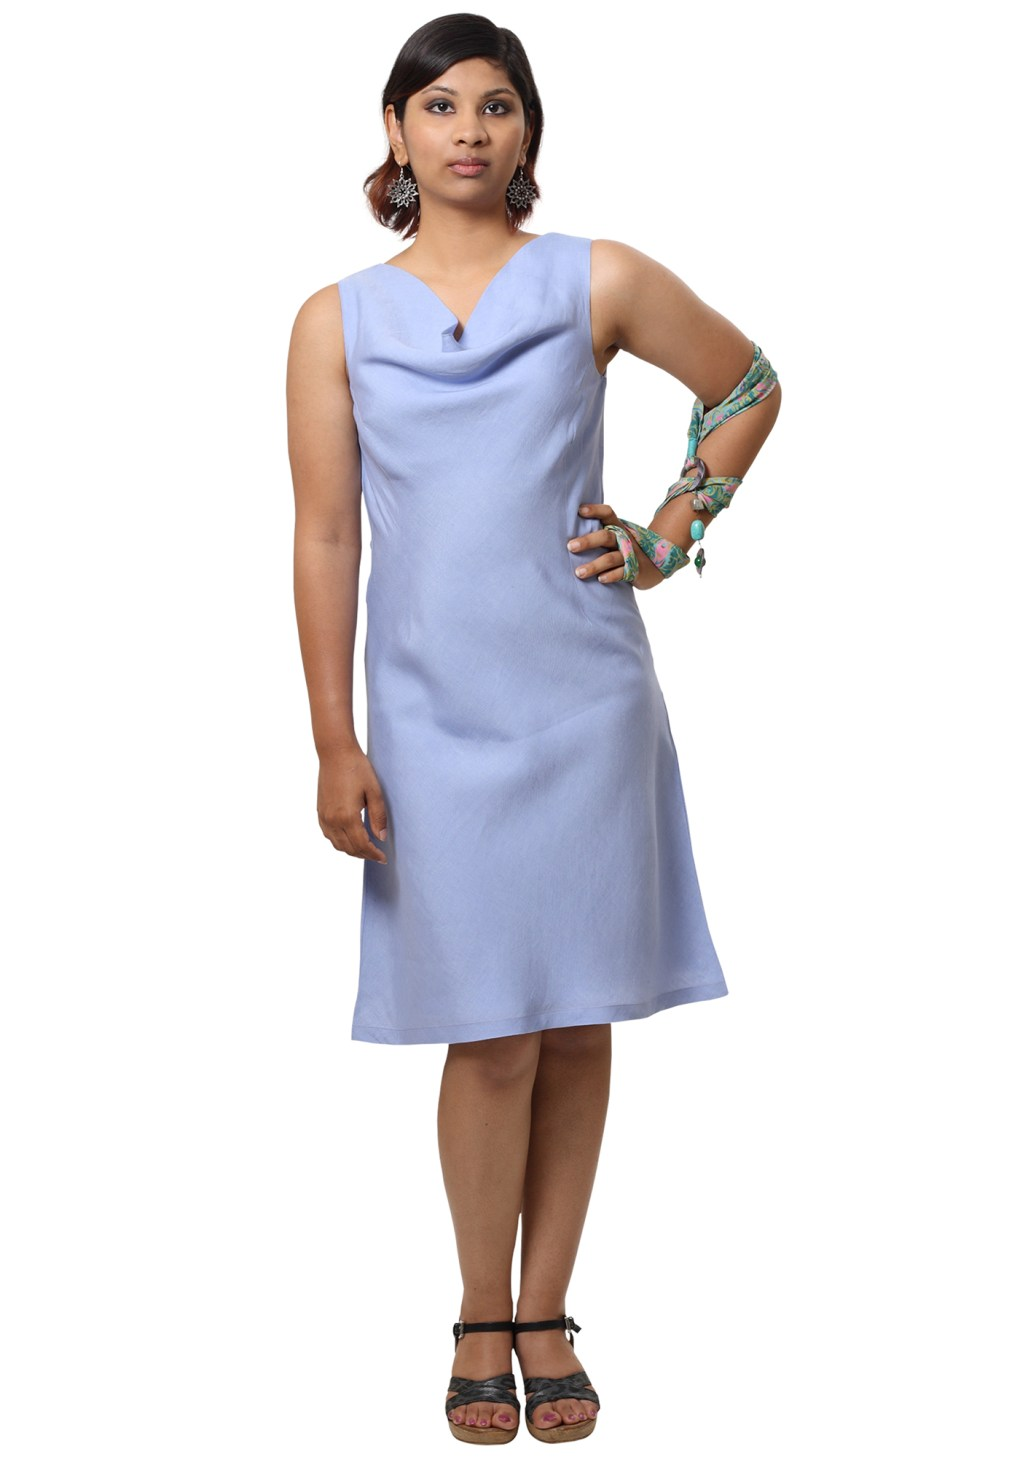 MINC Short Cowl Neck Dress in Lilac Linen